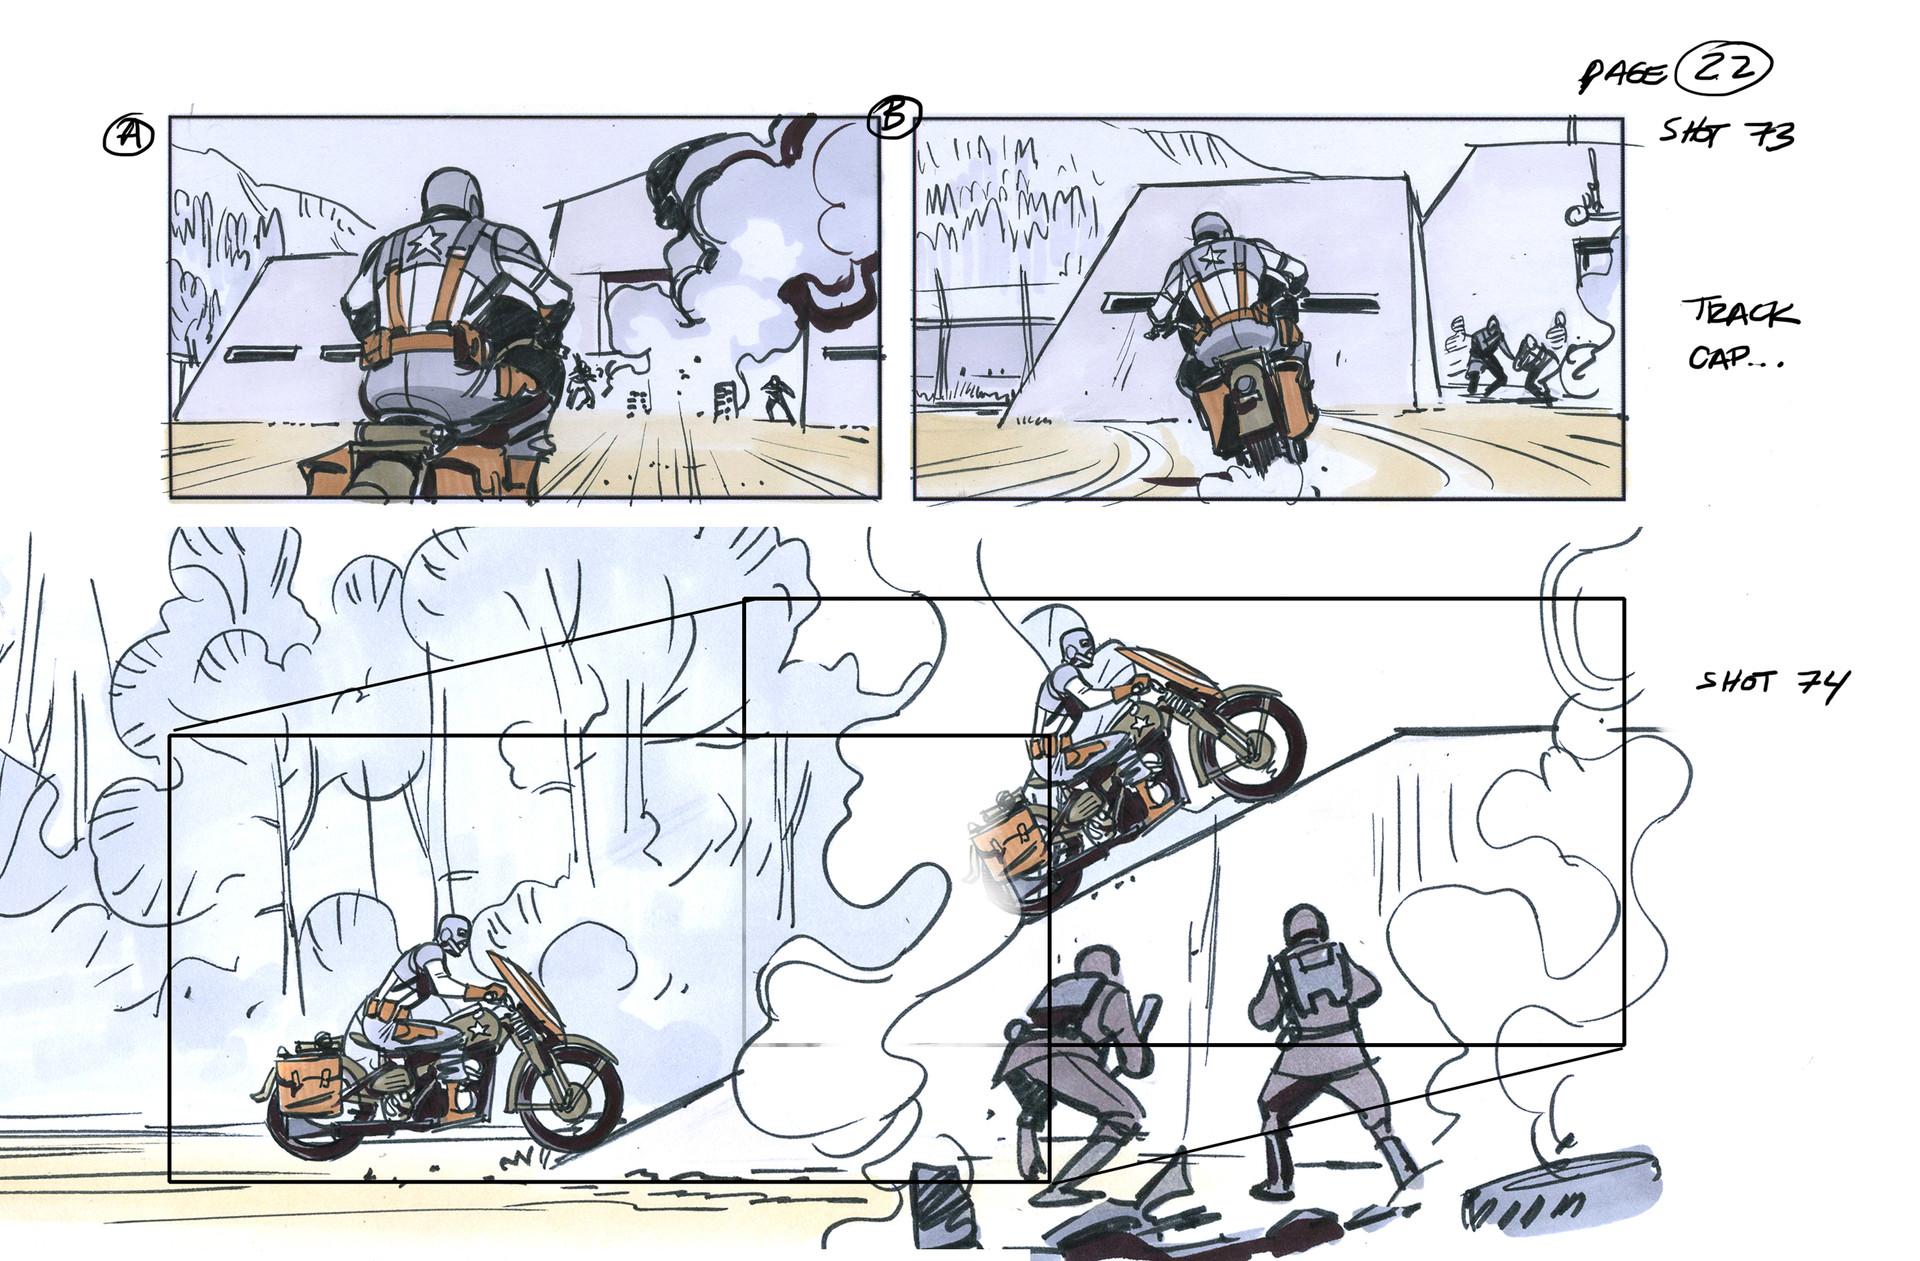 Rodolfo damaggio bike 22